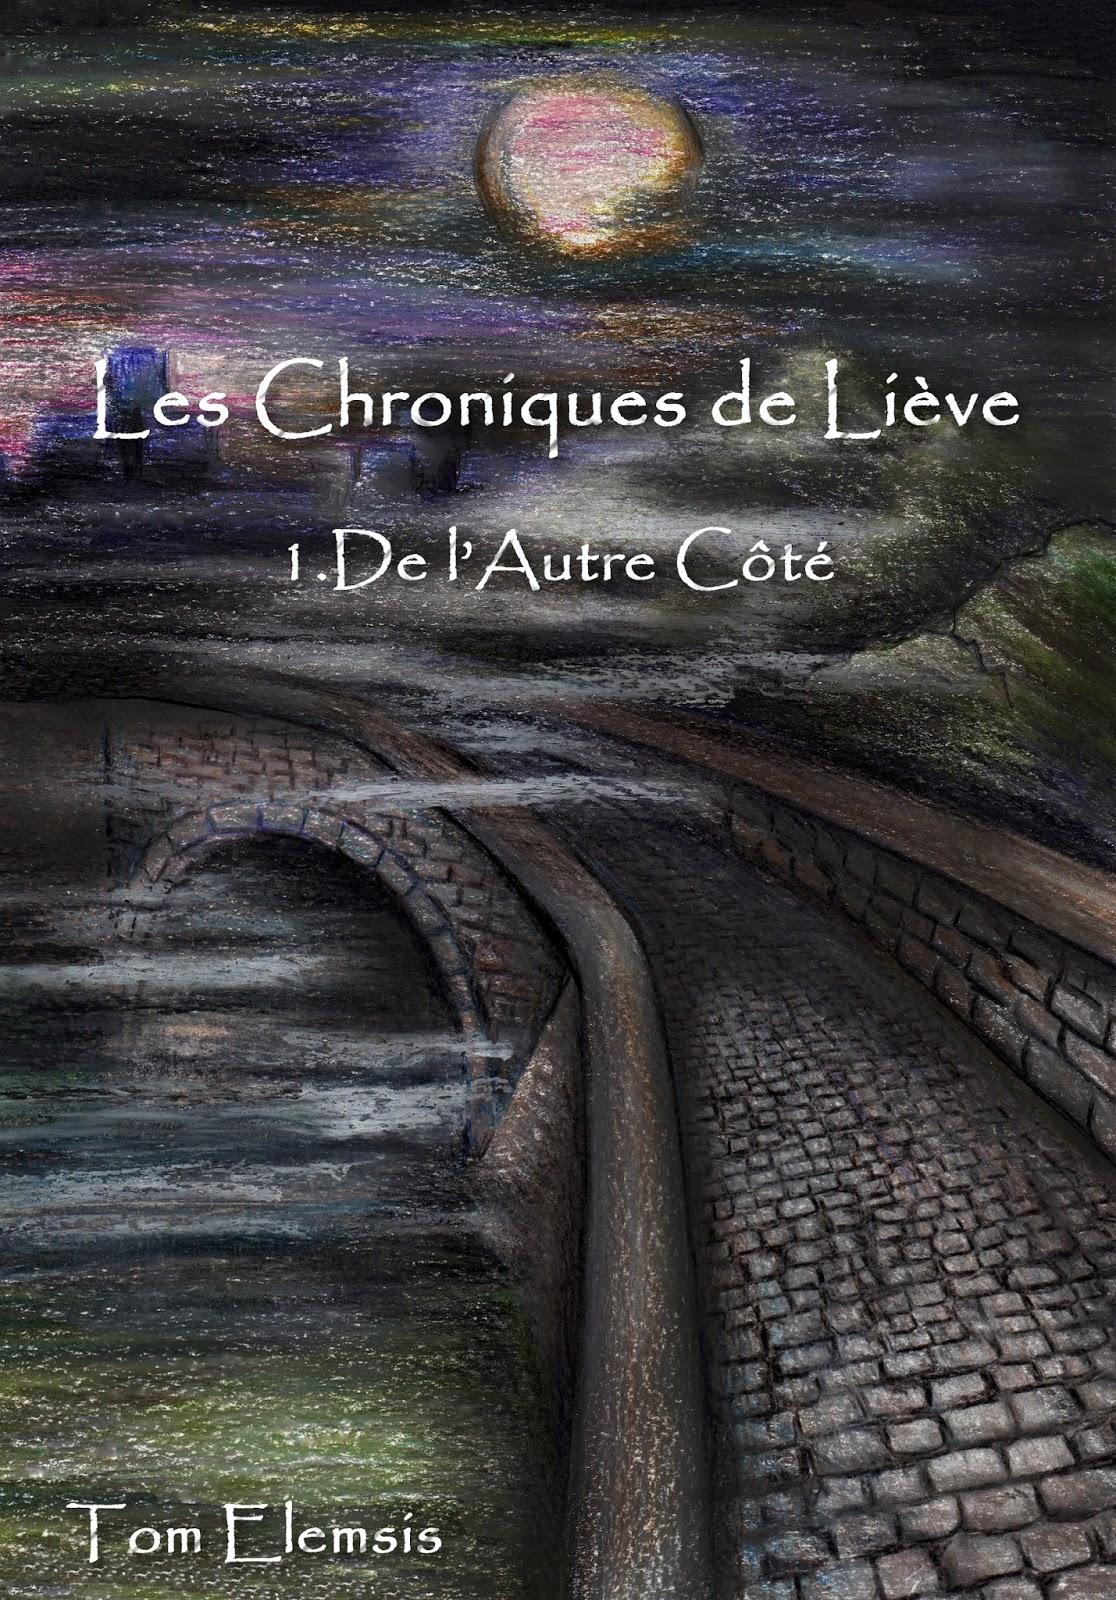 Les Chroniques de Liève 329232_f63ad14e278842b78bea0725185cbf9b